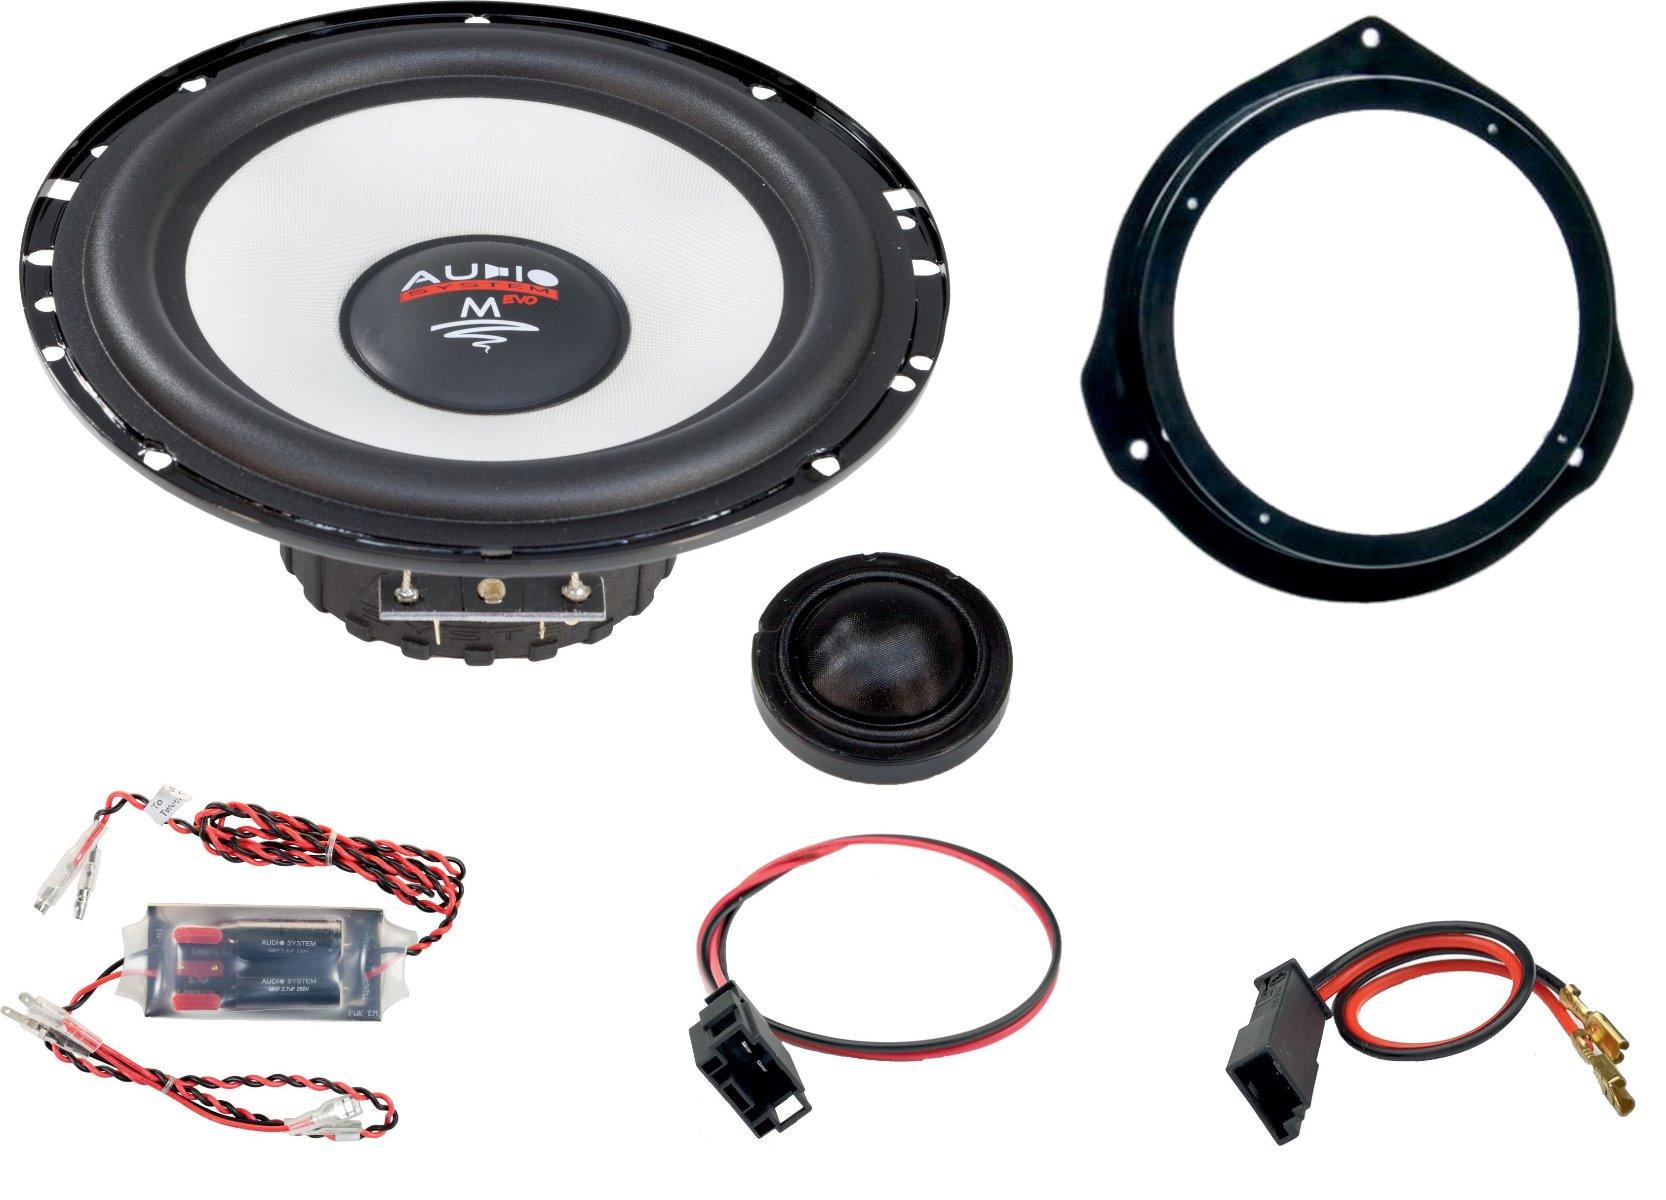 Audio System MFIT MERCEDES X-KLASSE 470 EVO 2 Lautsprecher 165 mm 2-Wege MERCEDES X-KLASSE 470 Compo System